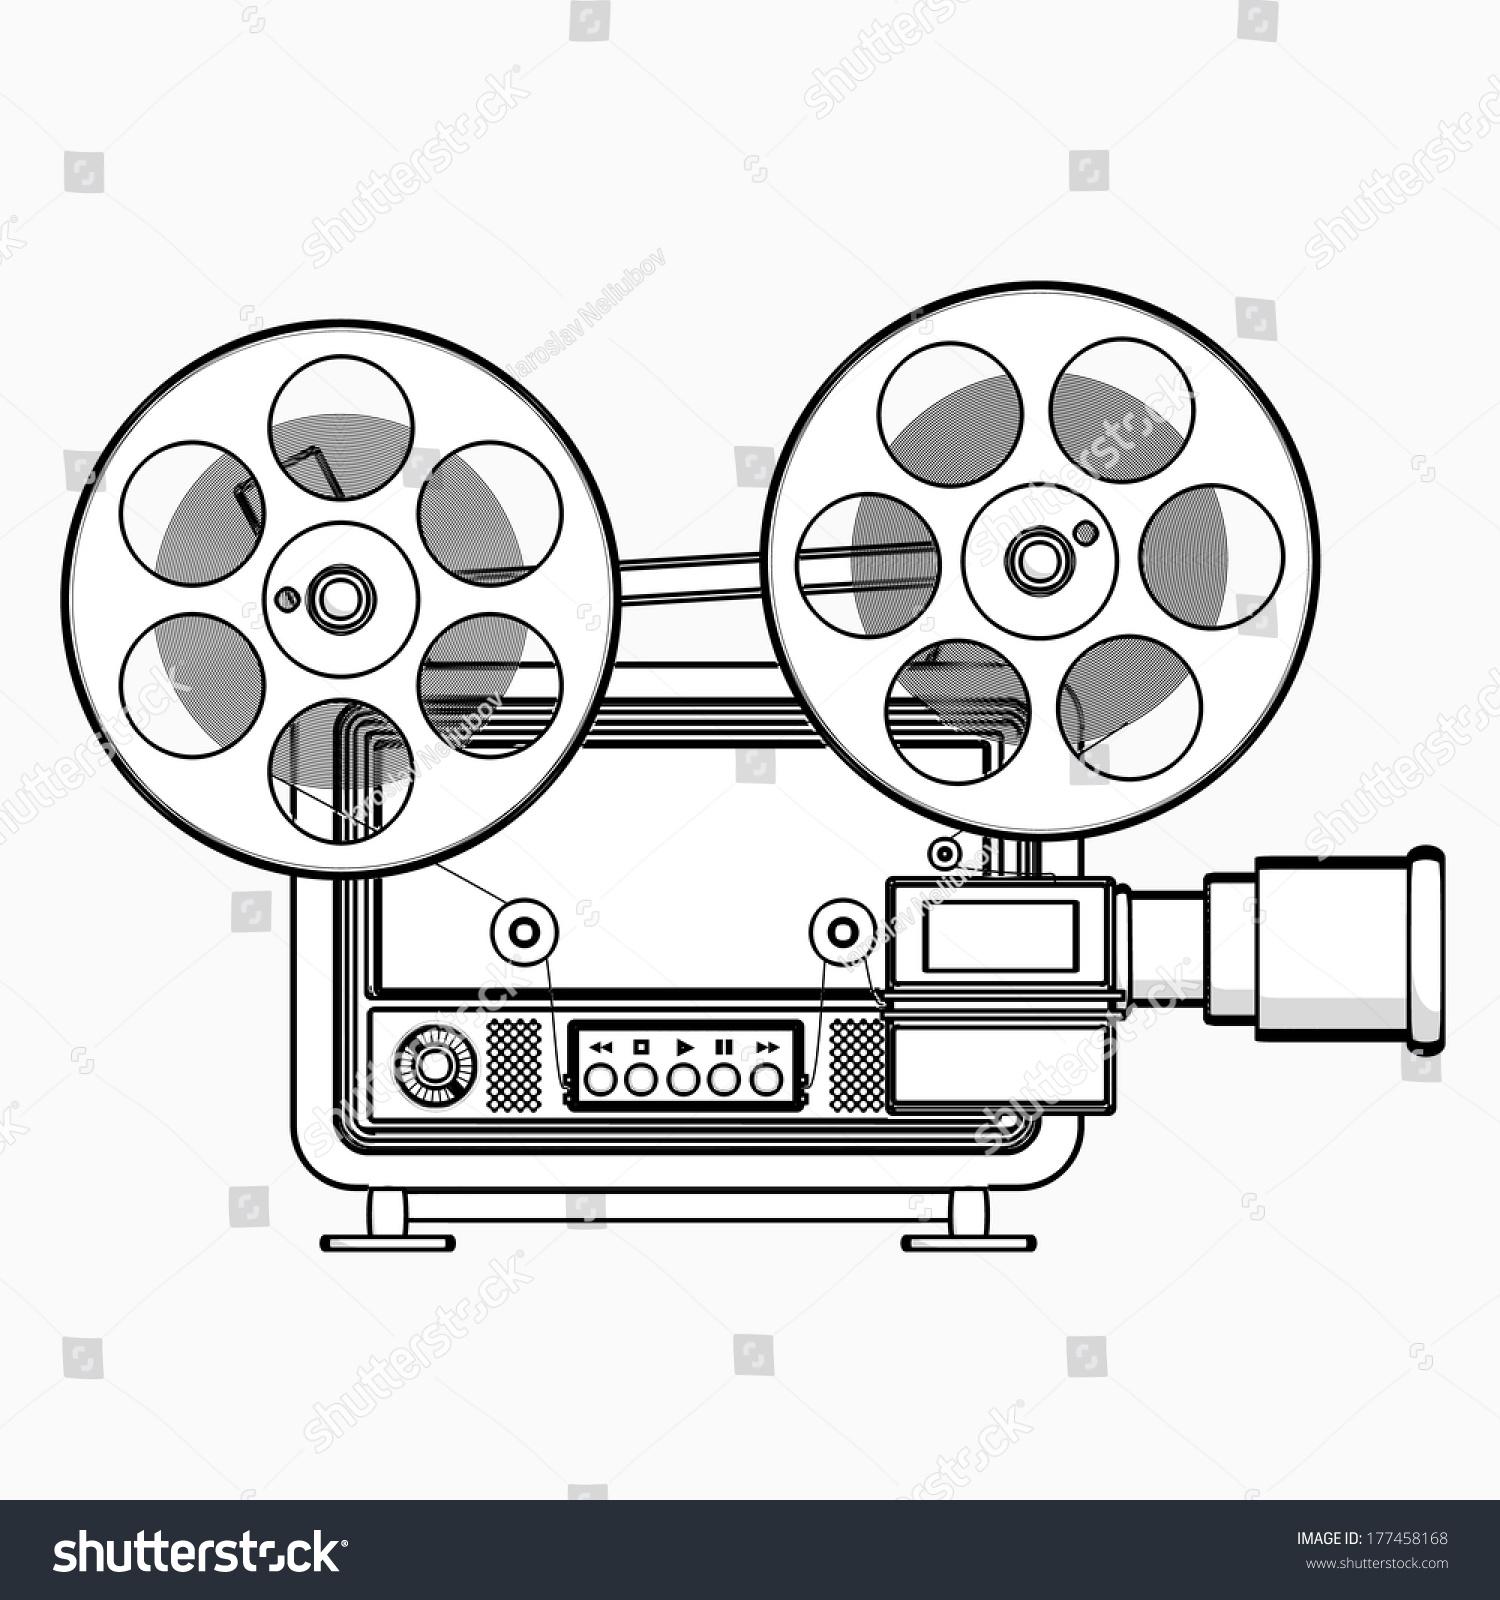 Old Fashioned Cinema Projector Cartoon Illustration Outline High Resolution 3D 177458168